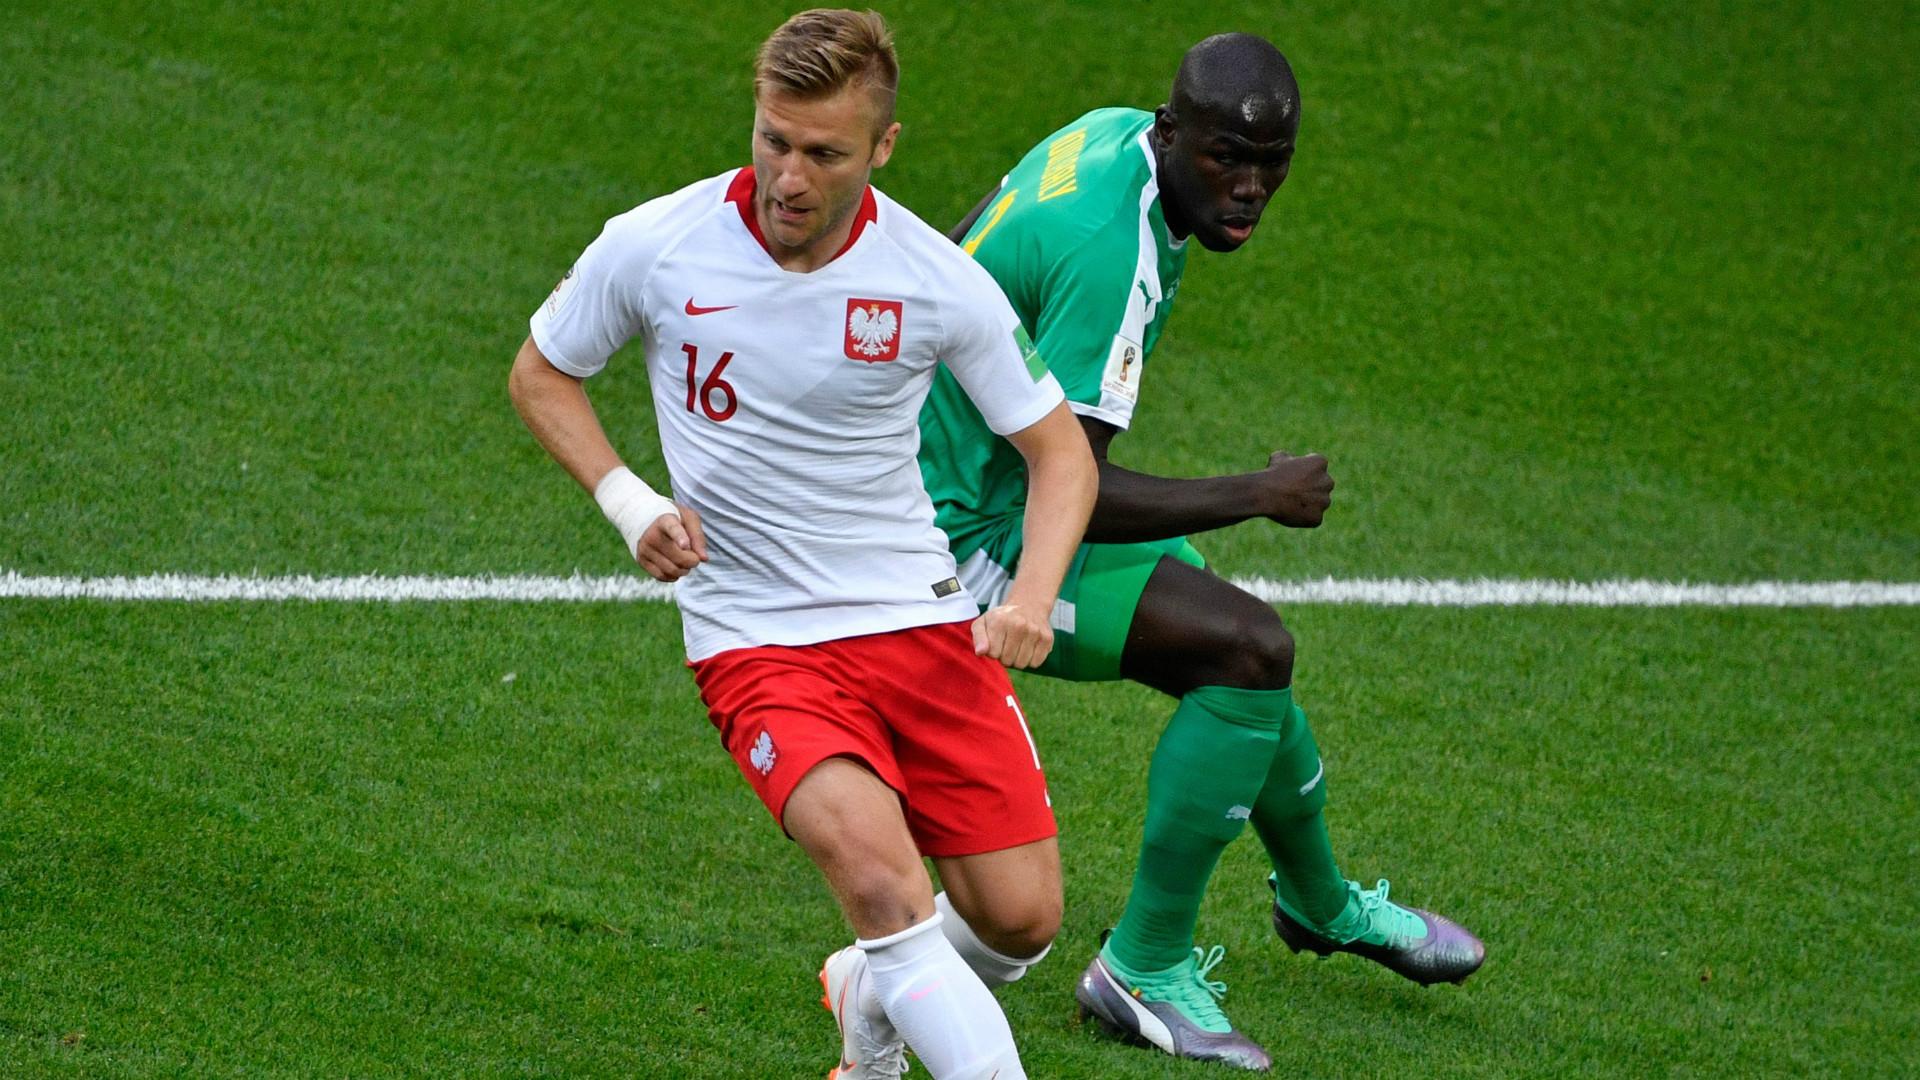 Jakub Błaszczykowski, Poland v Senegal, 2018 World Cup